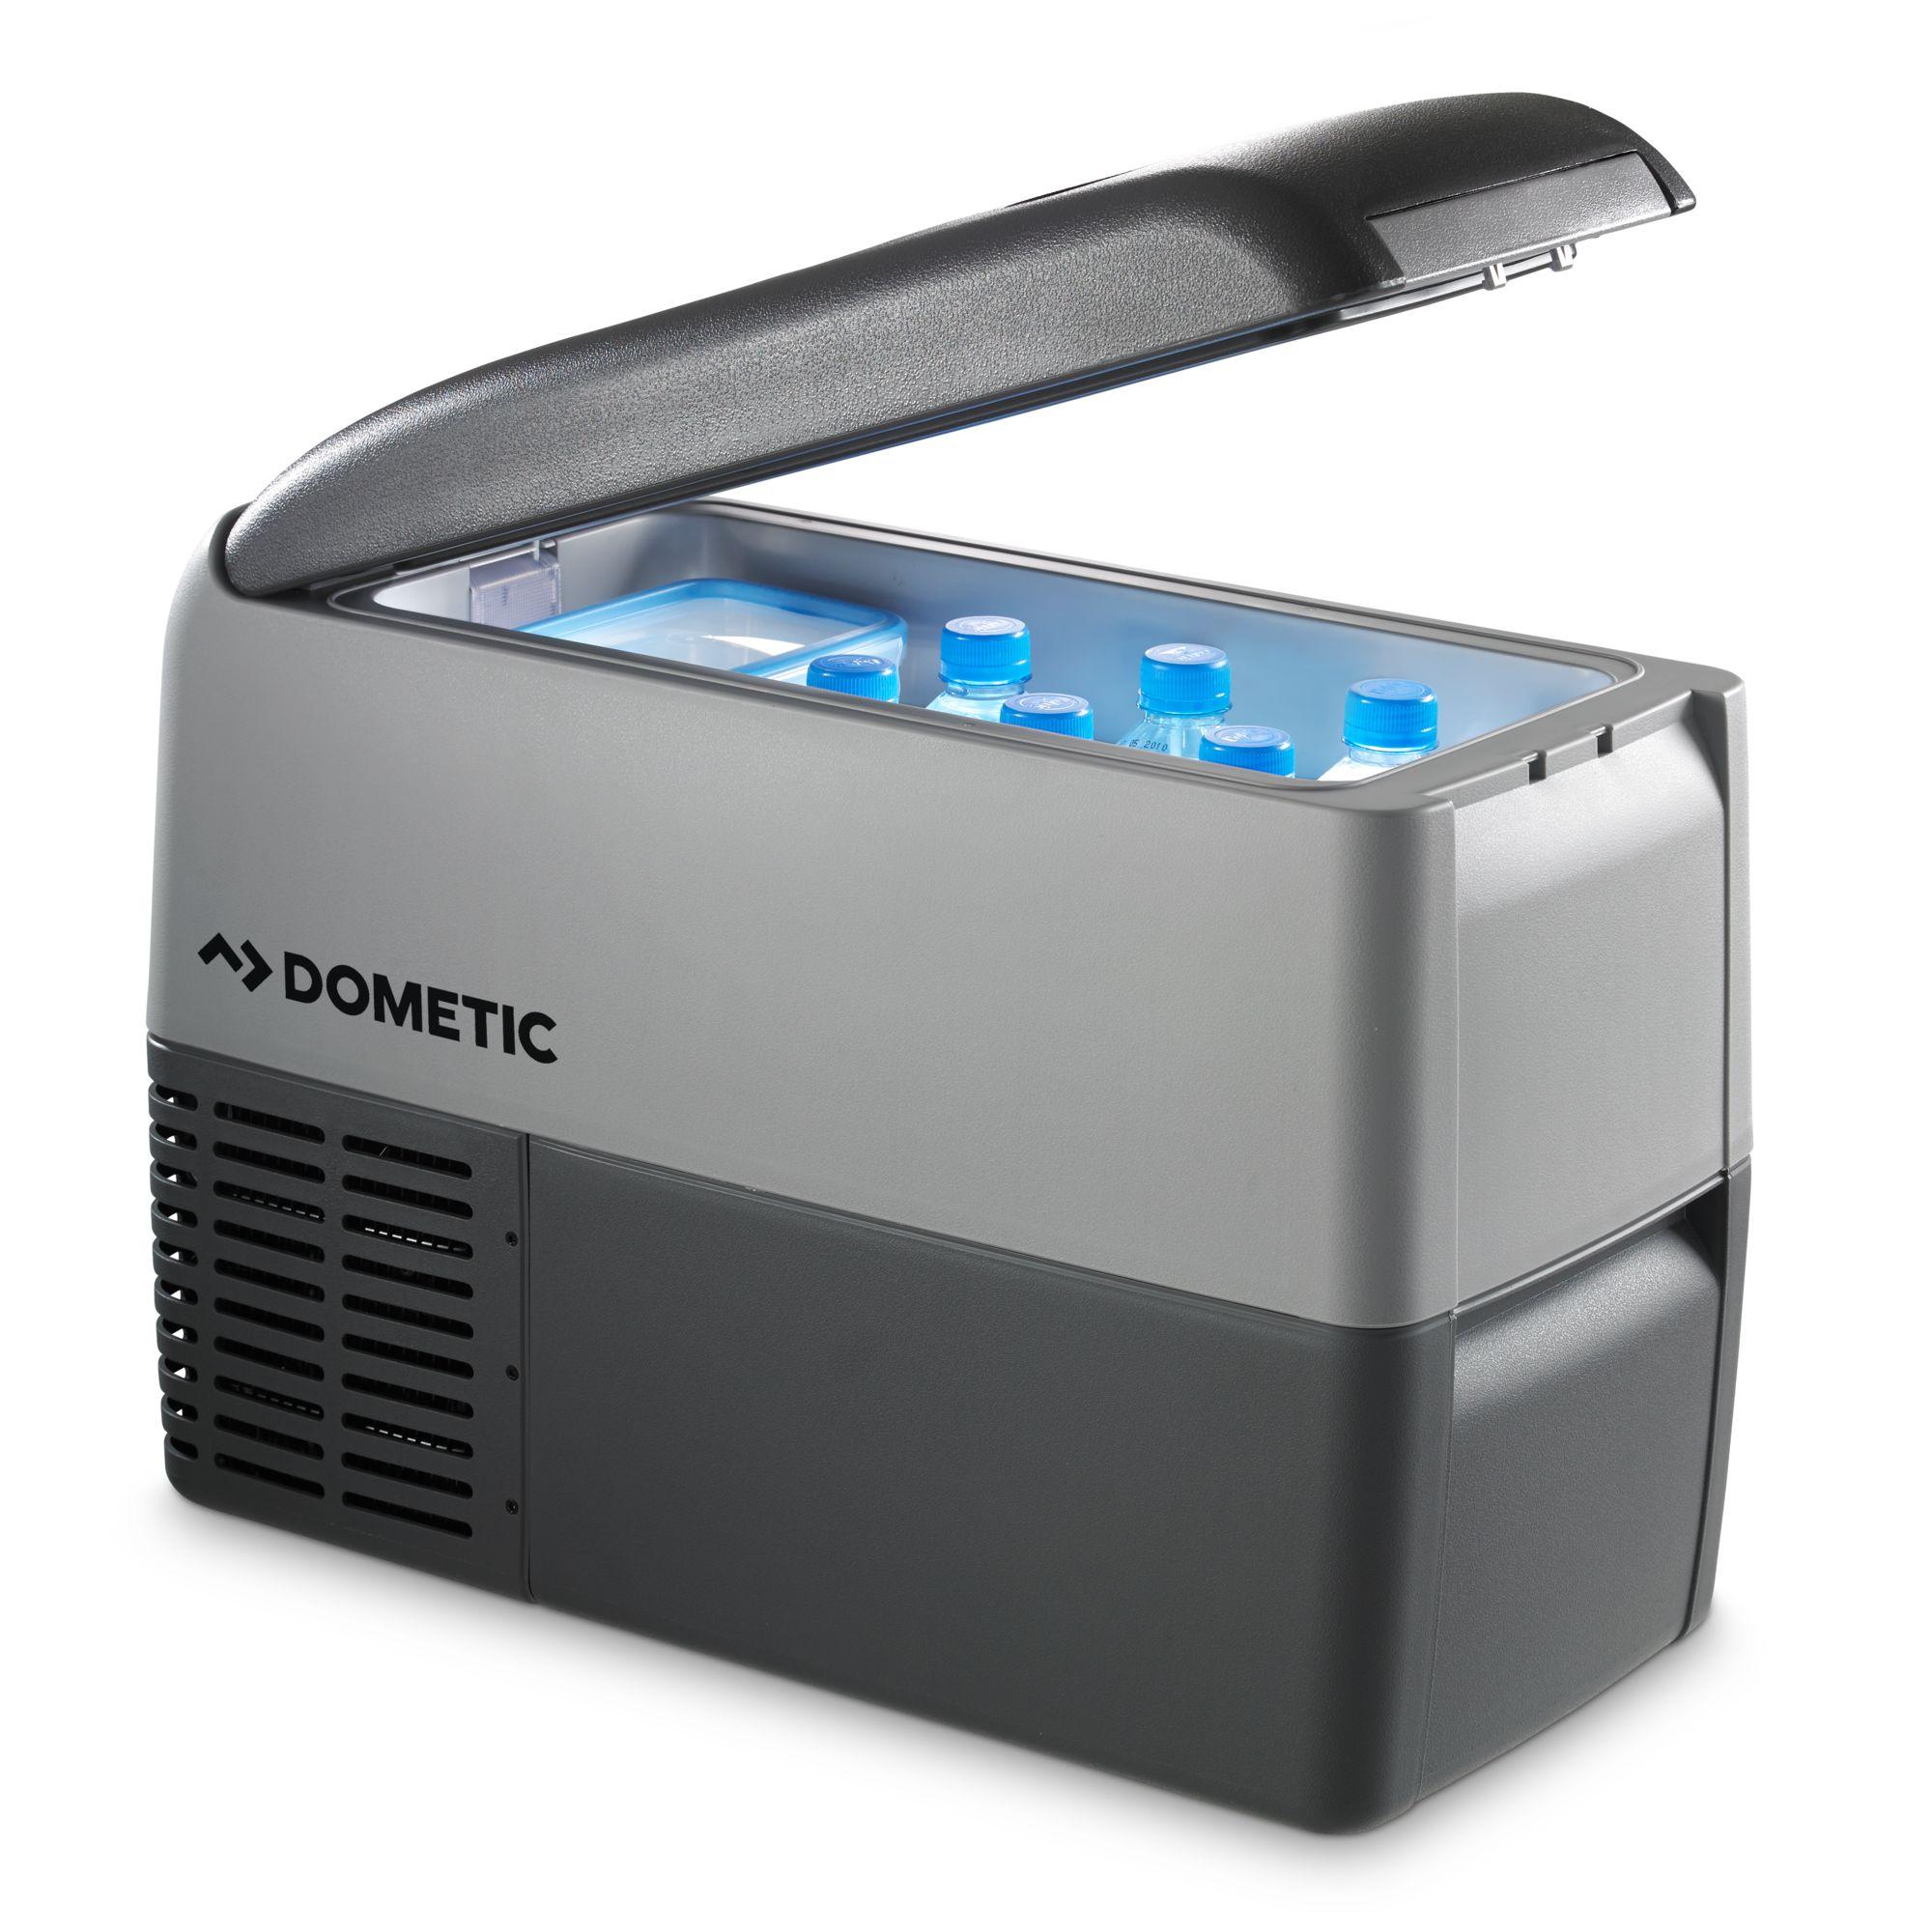 021 l dometic coolfreeze cdf-26 kompressor-kühlbox o.ovp - dometic